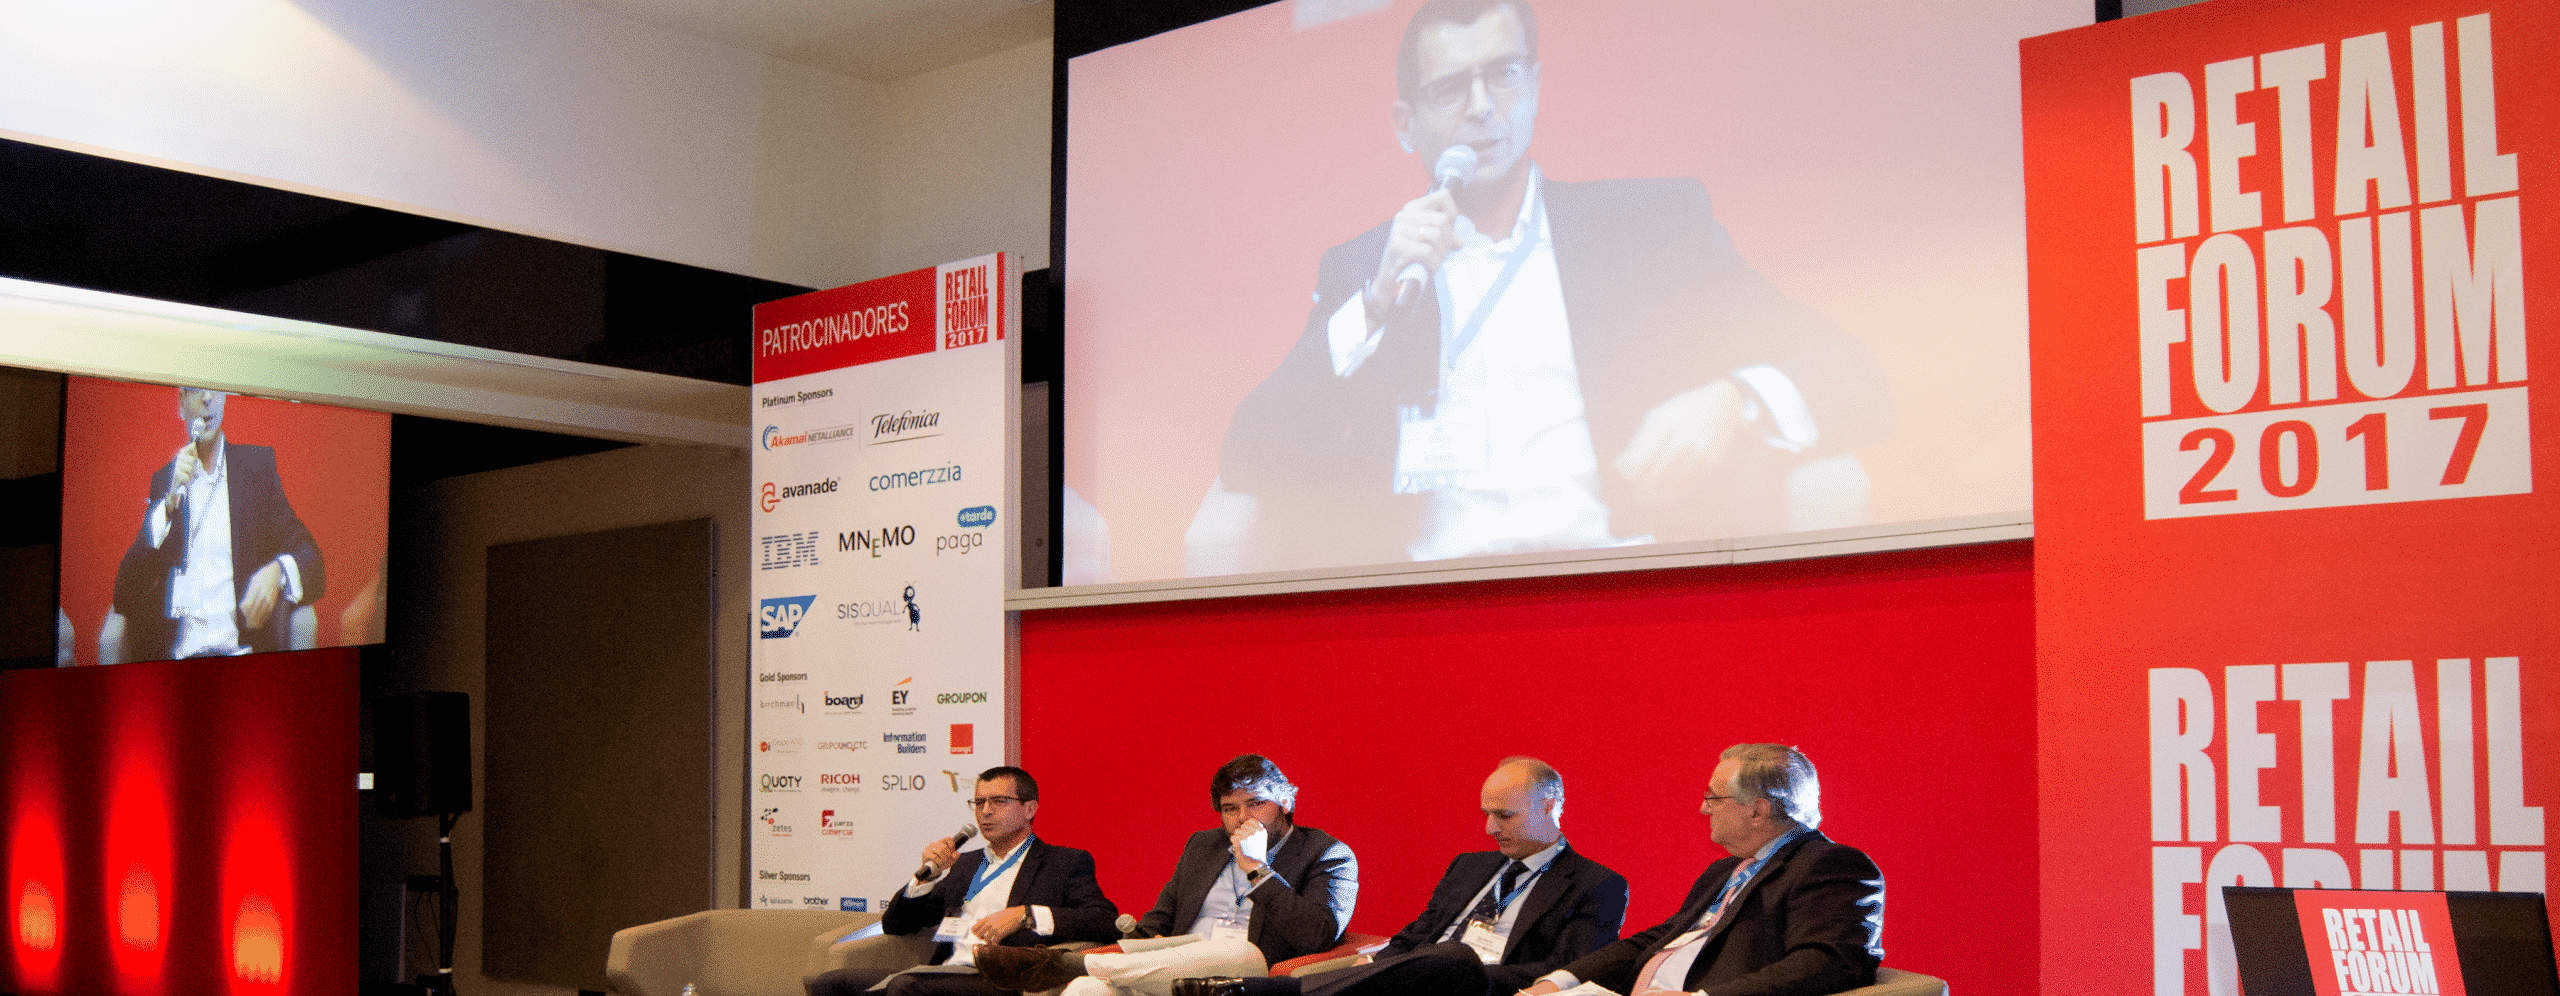 SISQUAL participated in the Retail Forum 2017